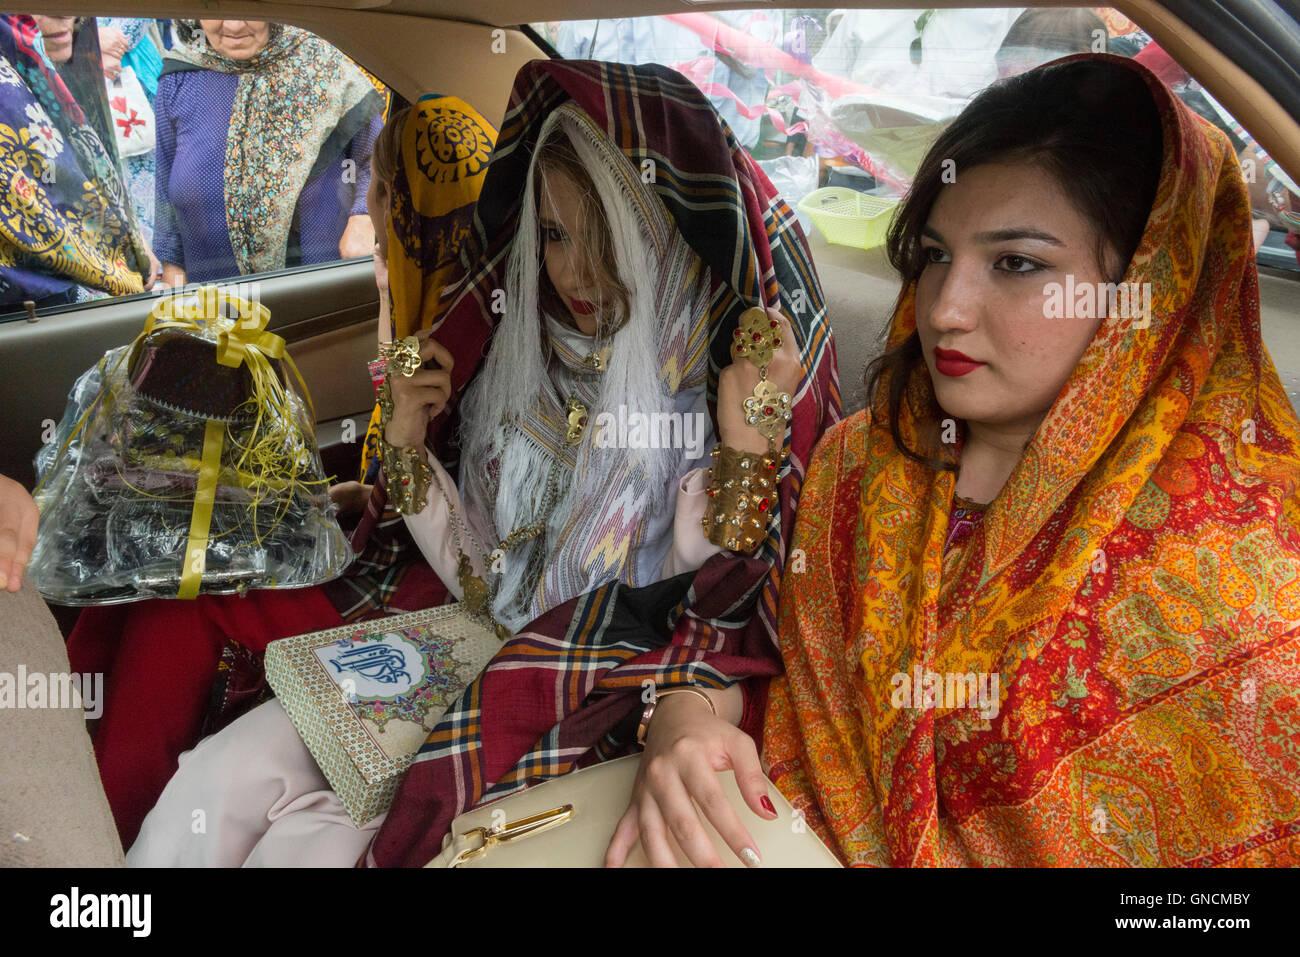 Bandar Torkaman, Turkmen Wedding, Bride Sitting With Female Relatives Inside Bridal Car - Stock Image